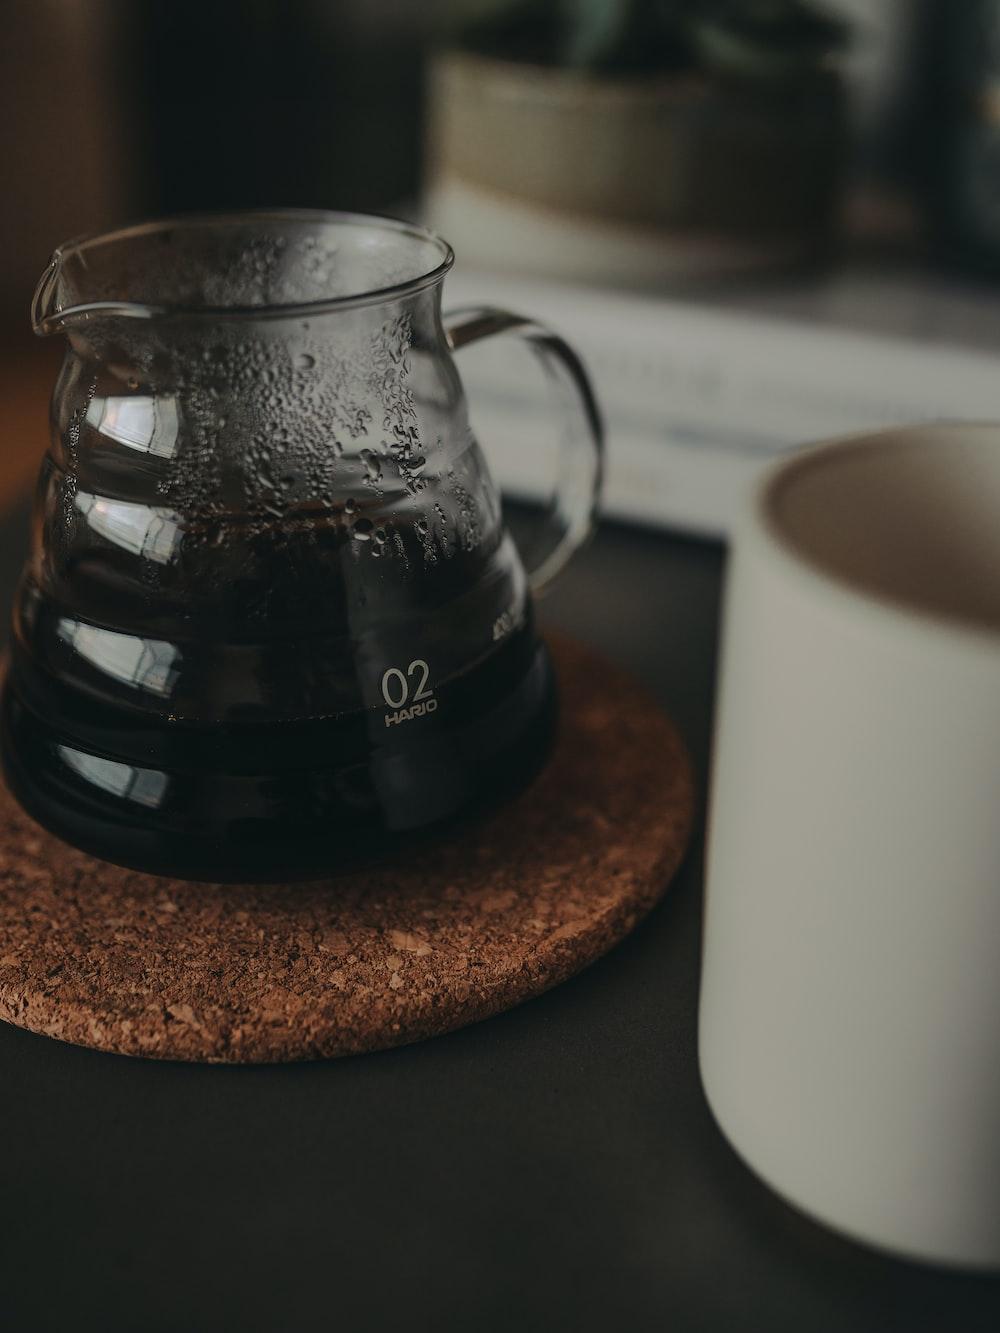 clear glass pitcher and white ceramic mug